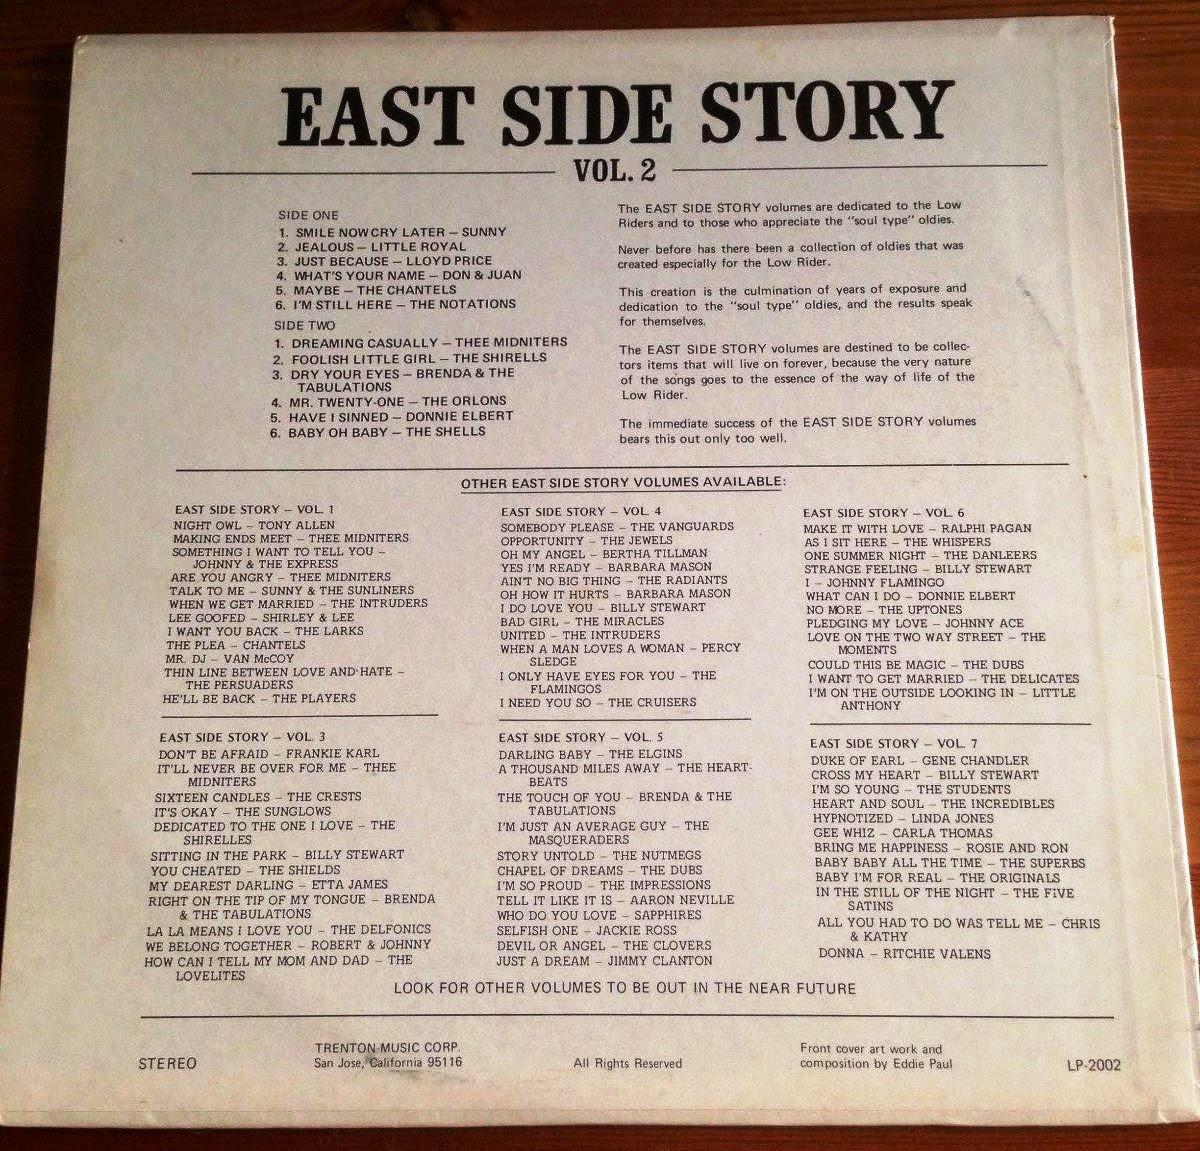 east side story vol 1-12